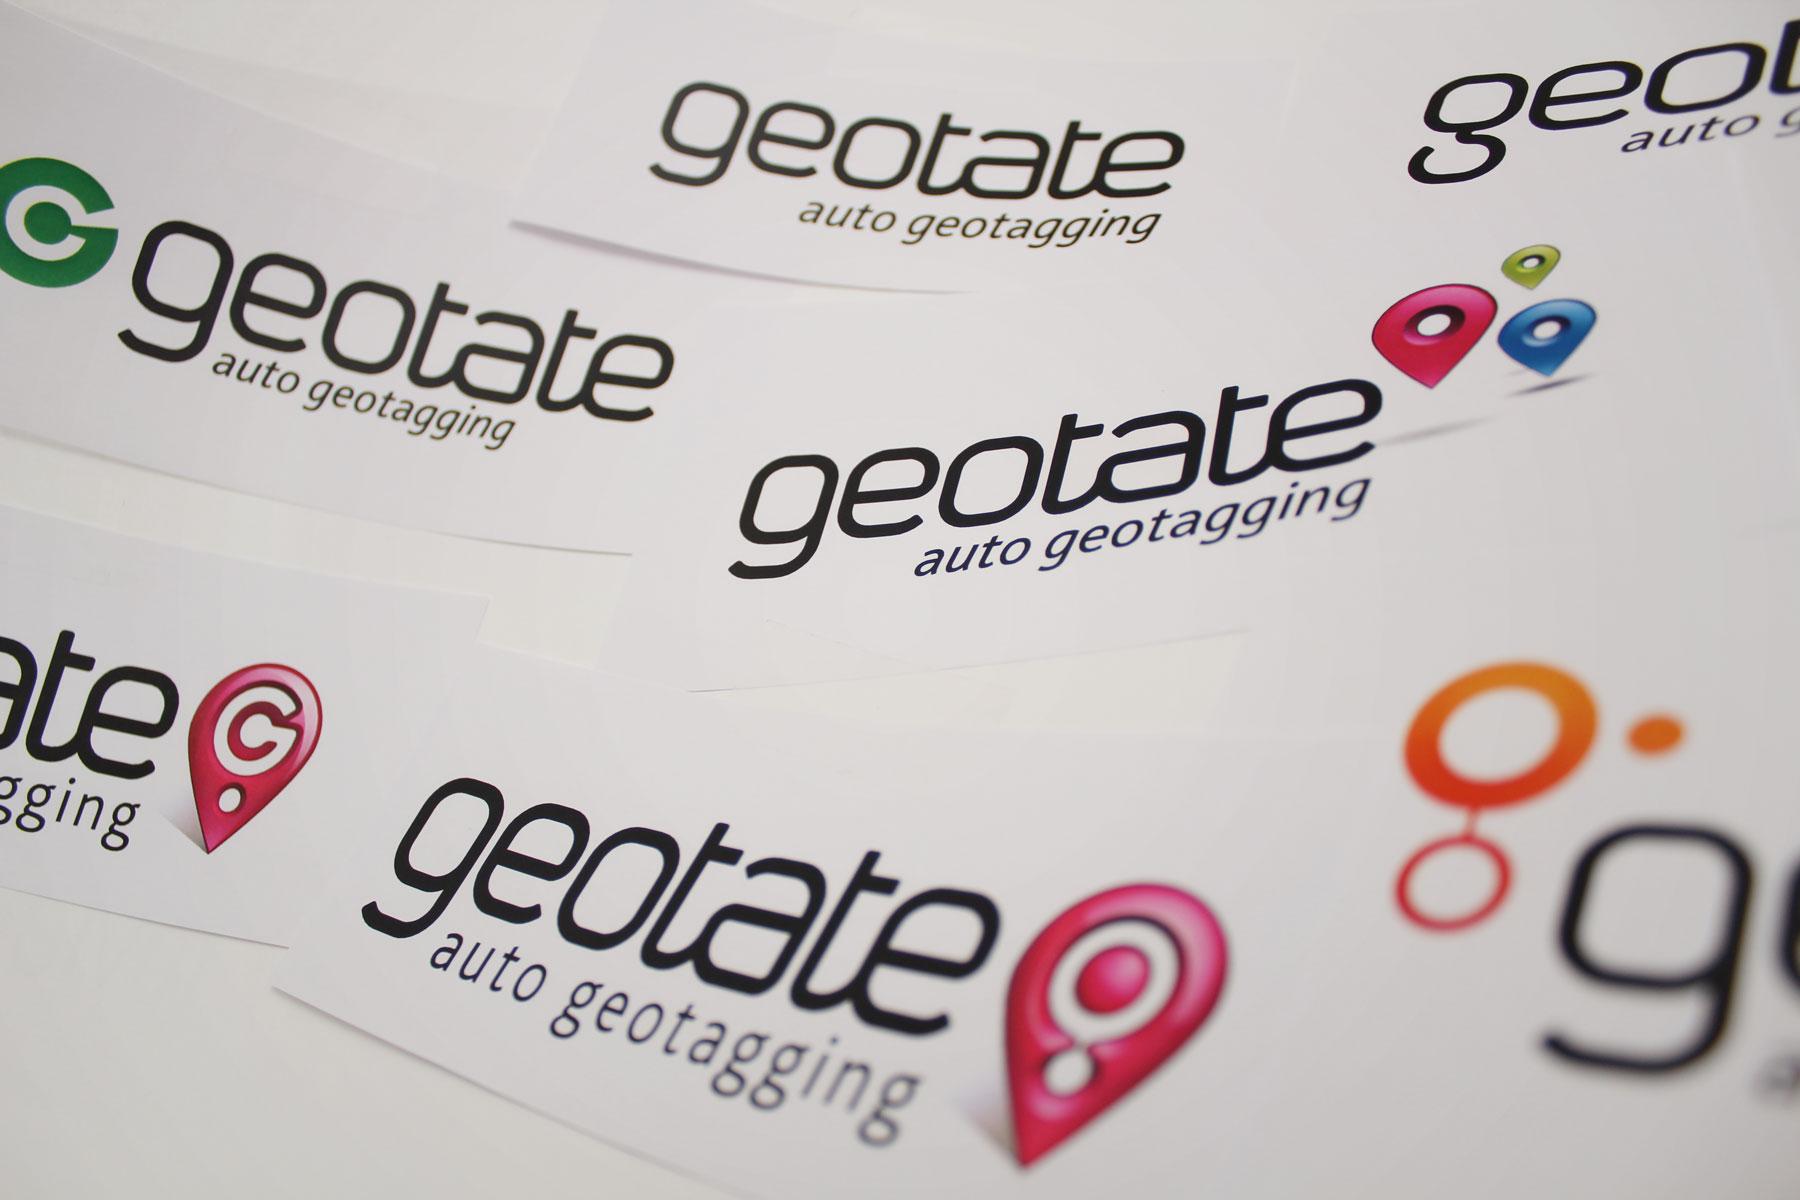 geotate_003